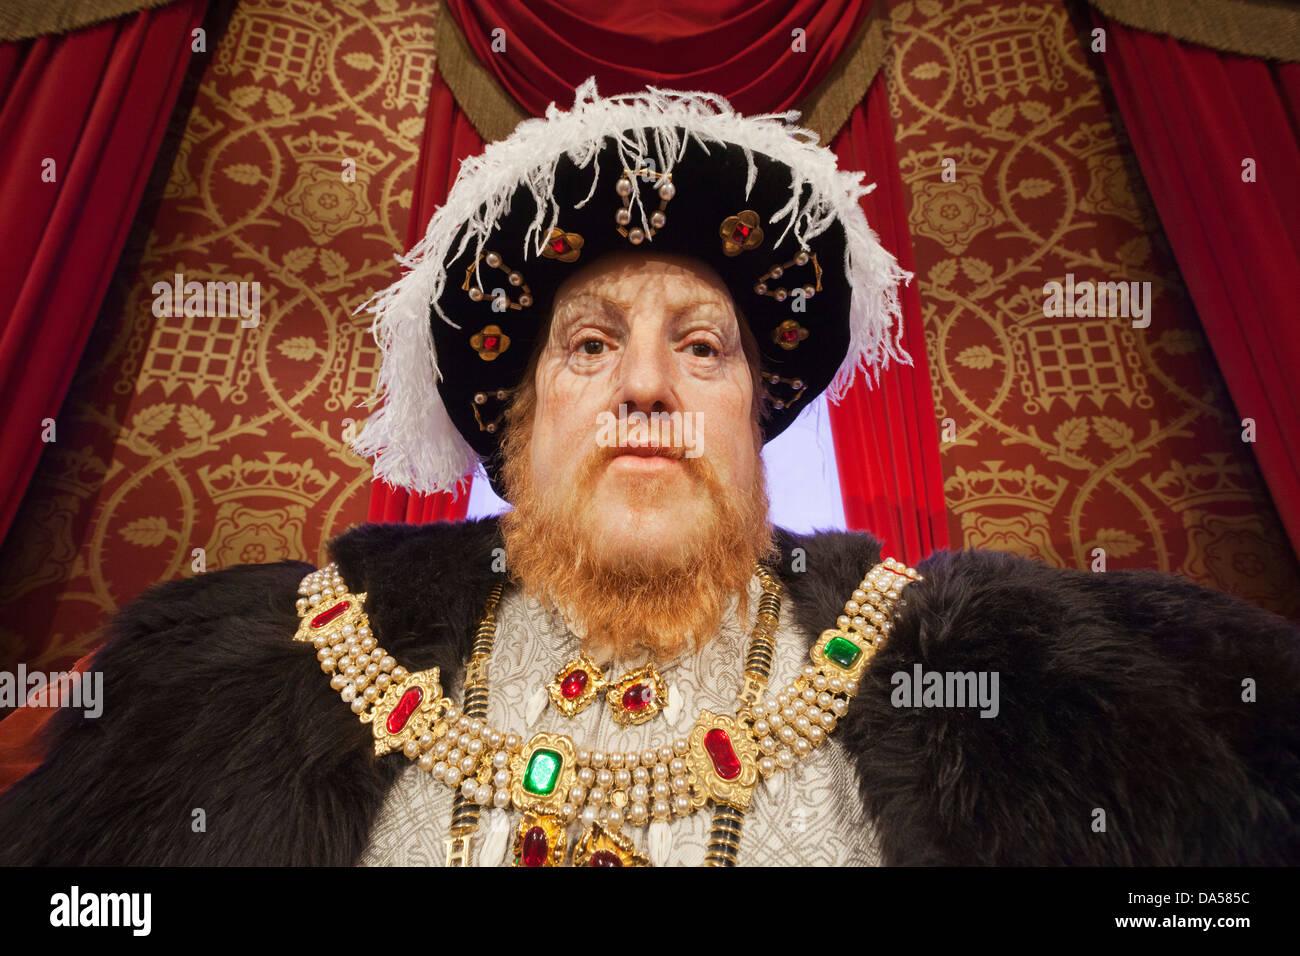 England, London, Madame Tussauds, Waxwork Display of Henry VIII - Stock Image